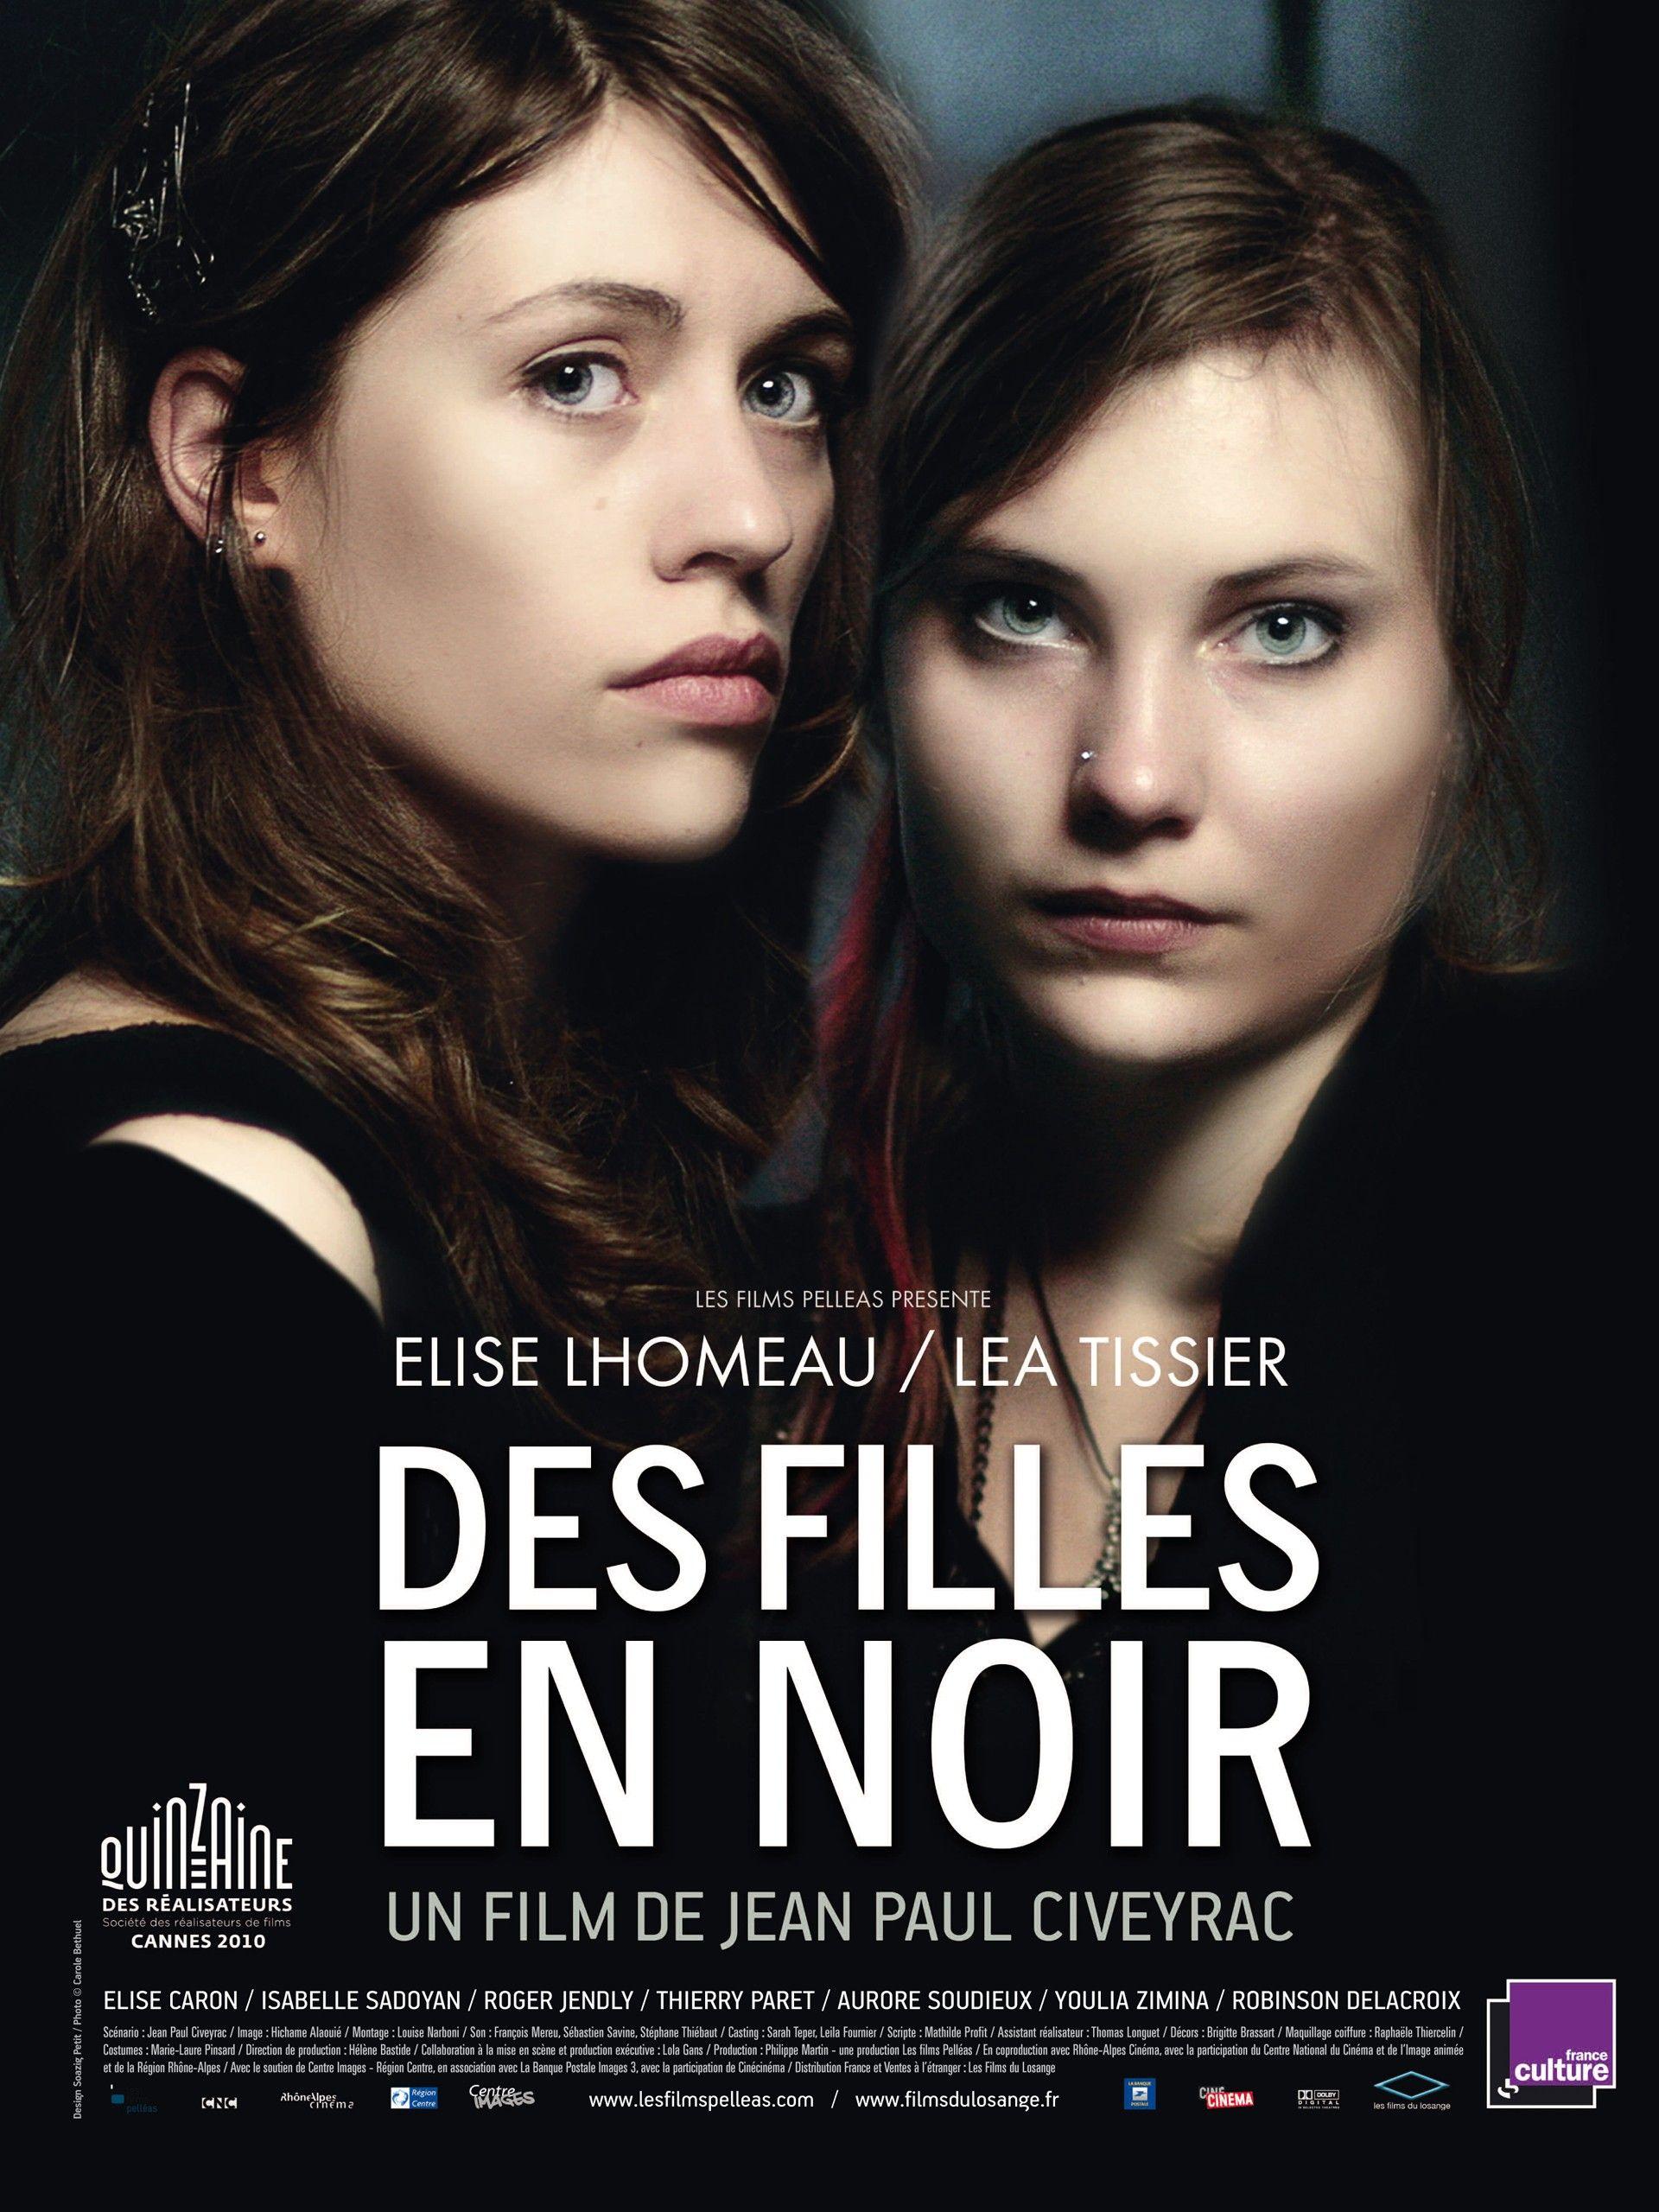 Des Filles En Noir 03 11 2010 Filles En Noir Films Complets Film